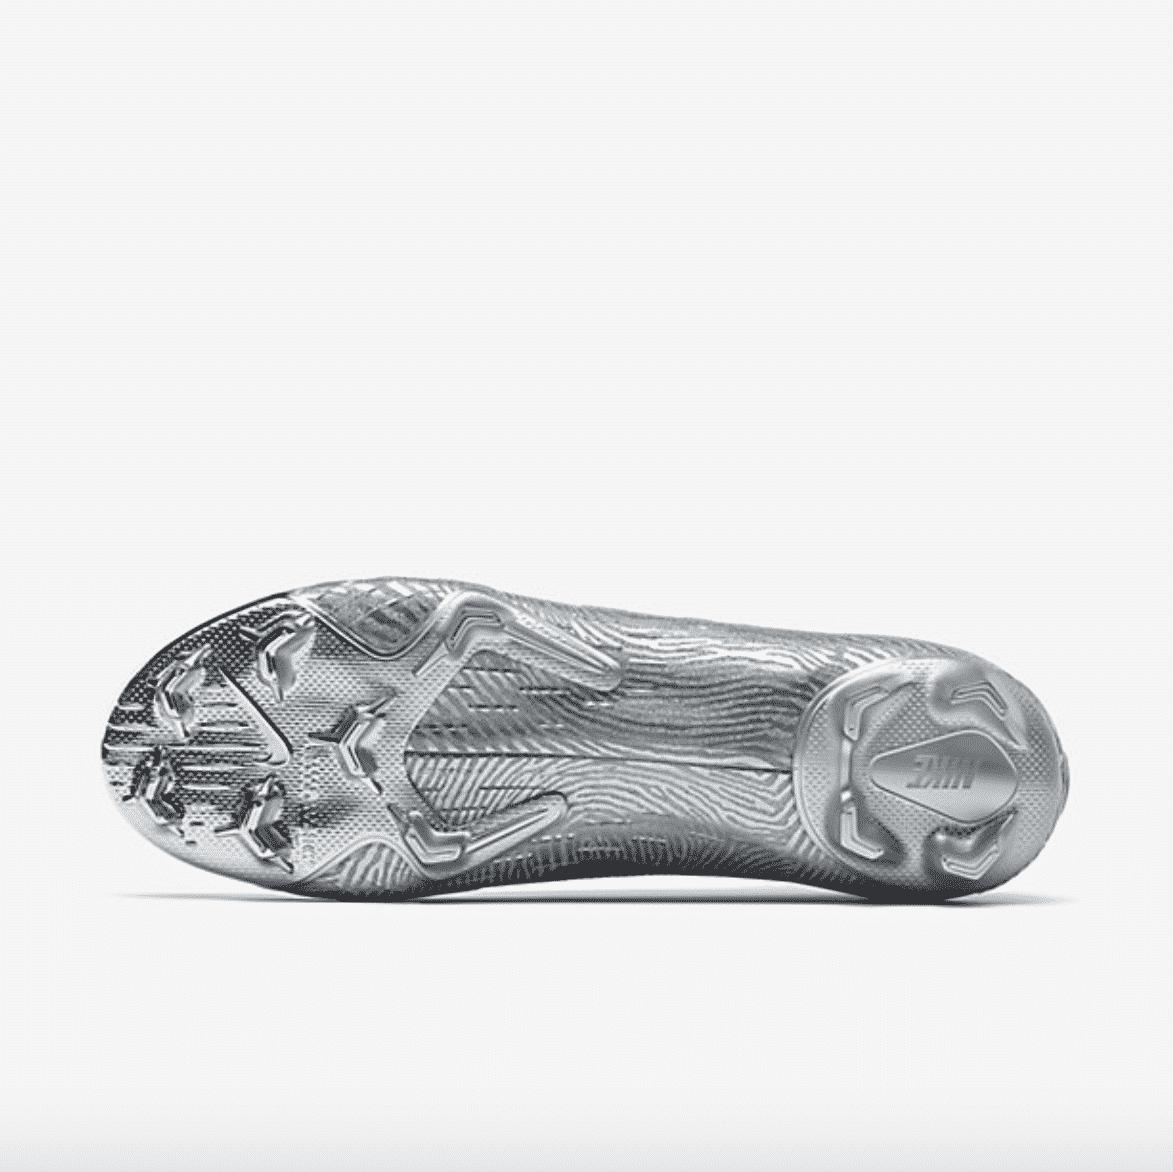 chaussure-nike-mercurial-vapor-modric-ballon-or-2